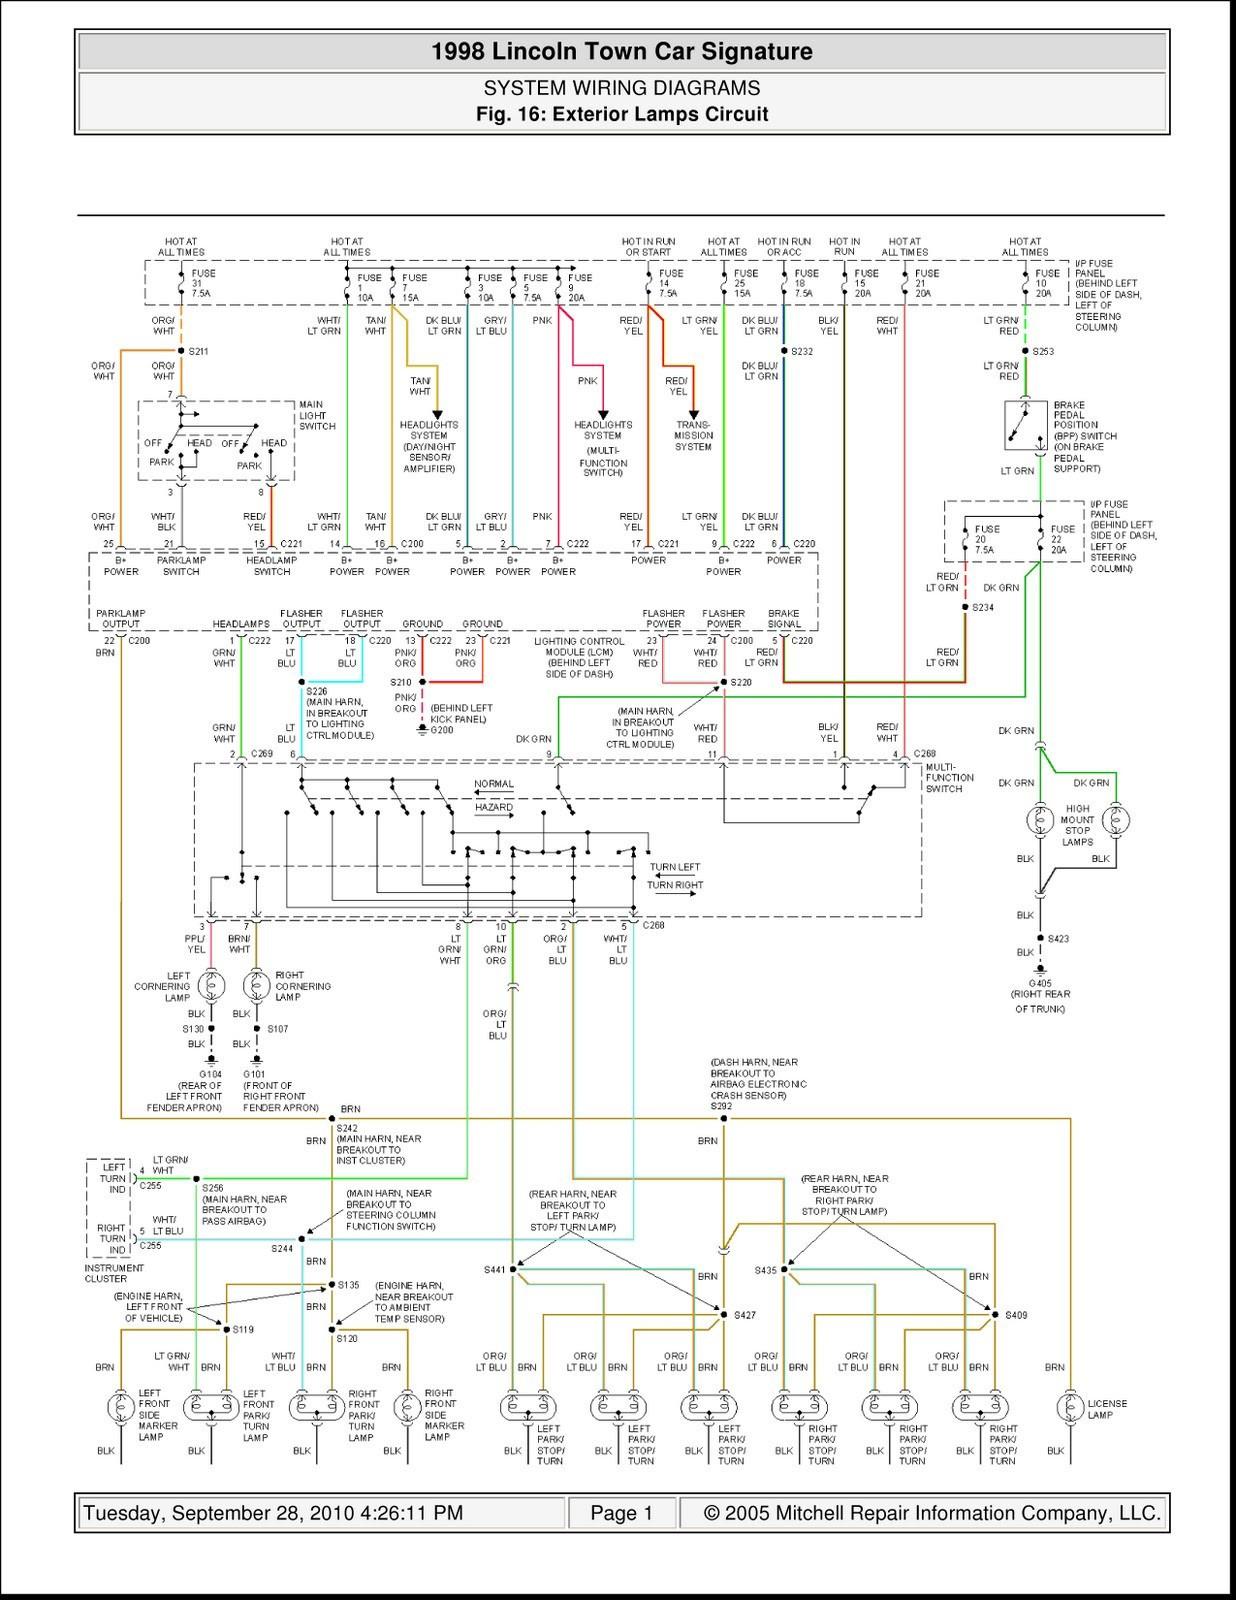 2000 Lincoln town Car Wiring Diagram 1998 Lincoln town Car Wiring Diagrams Worksheet and Wiring Diagram • Of 2000 Lincoln town Car Wiring Diagram